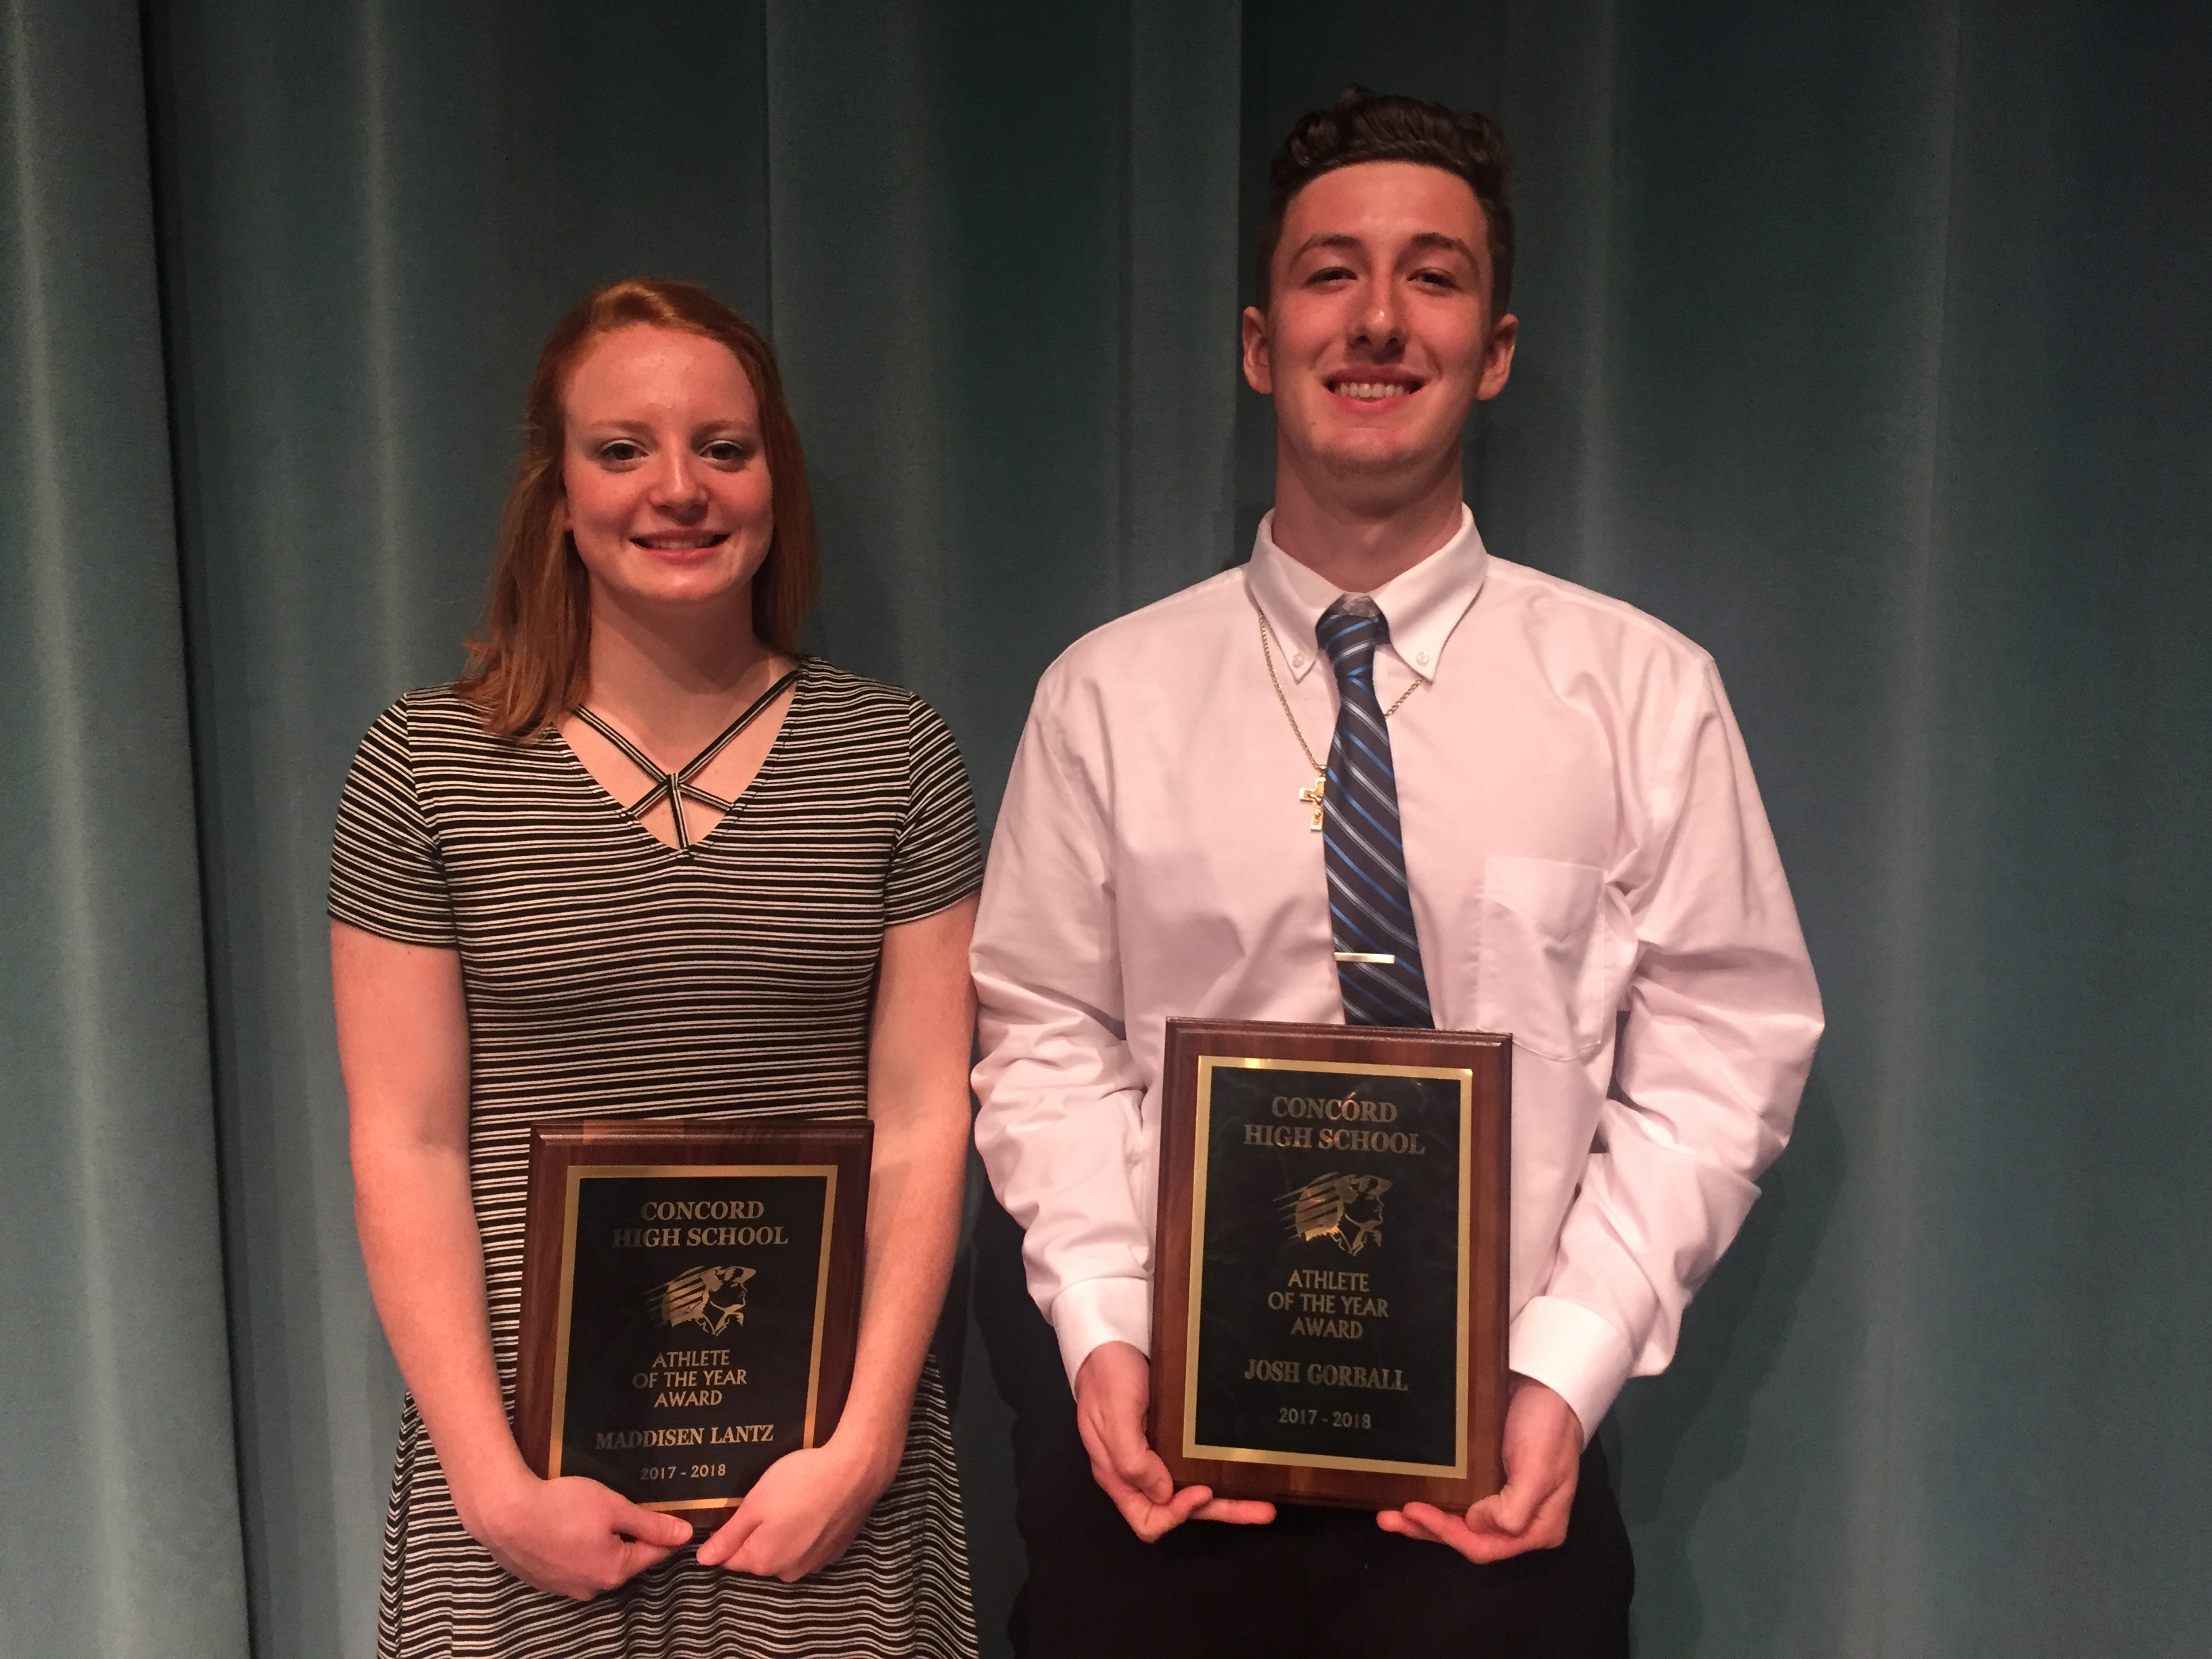 2017-2018 Athletic Department Award Winners